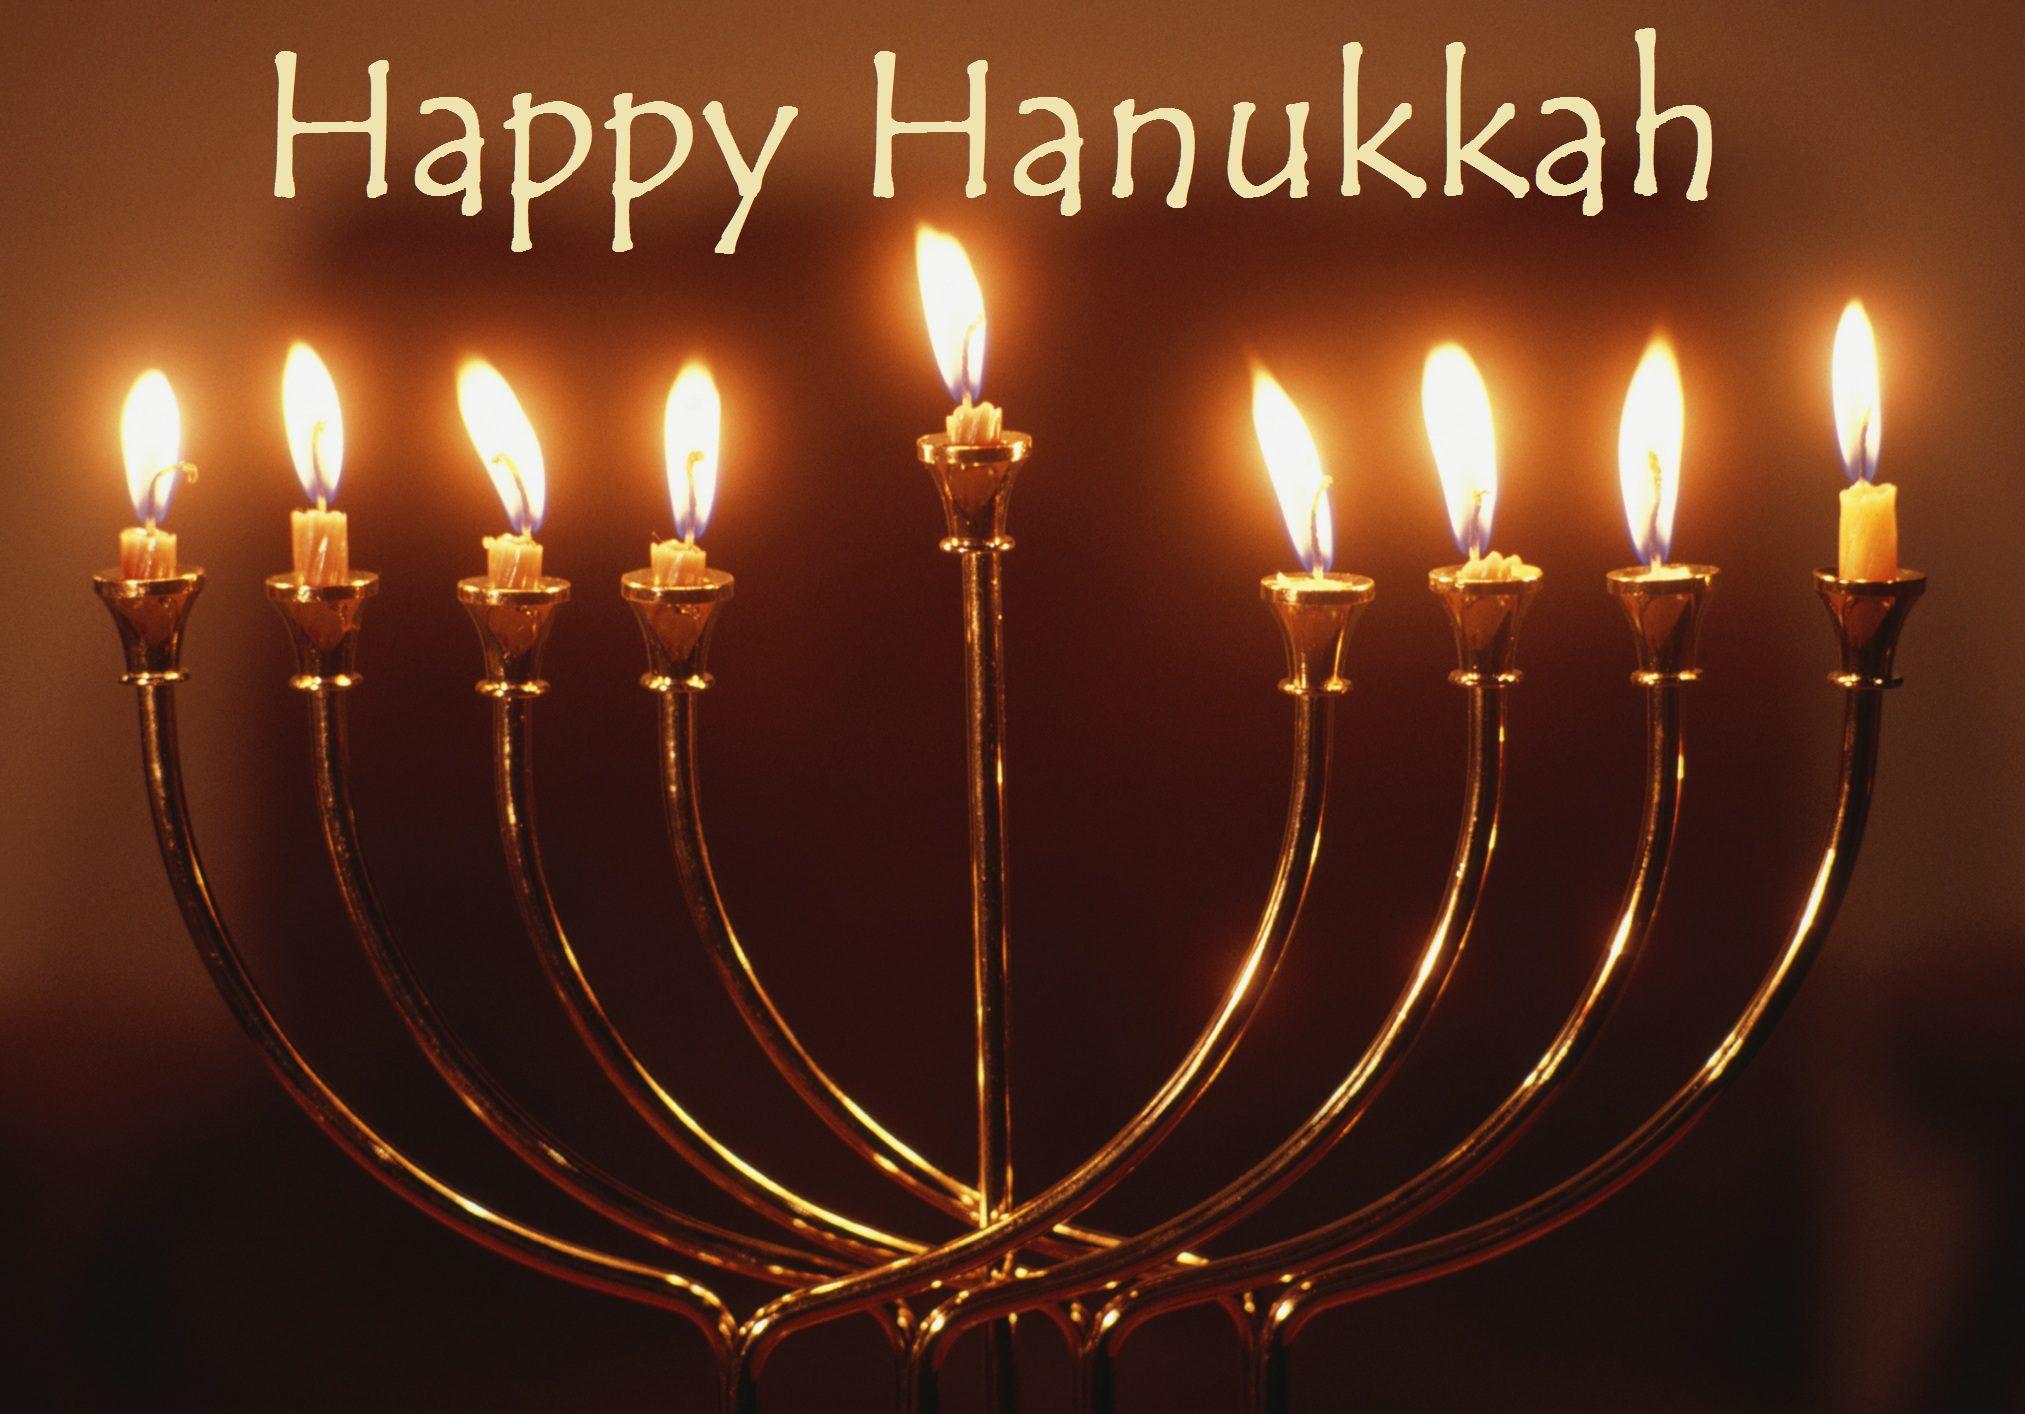 Jewish festivals the guibord center hanukkah m4hsunfo